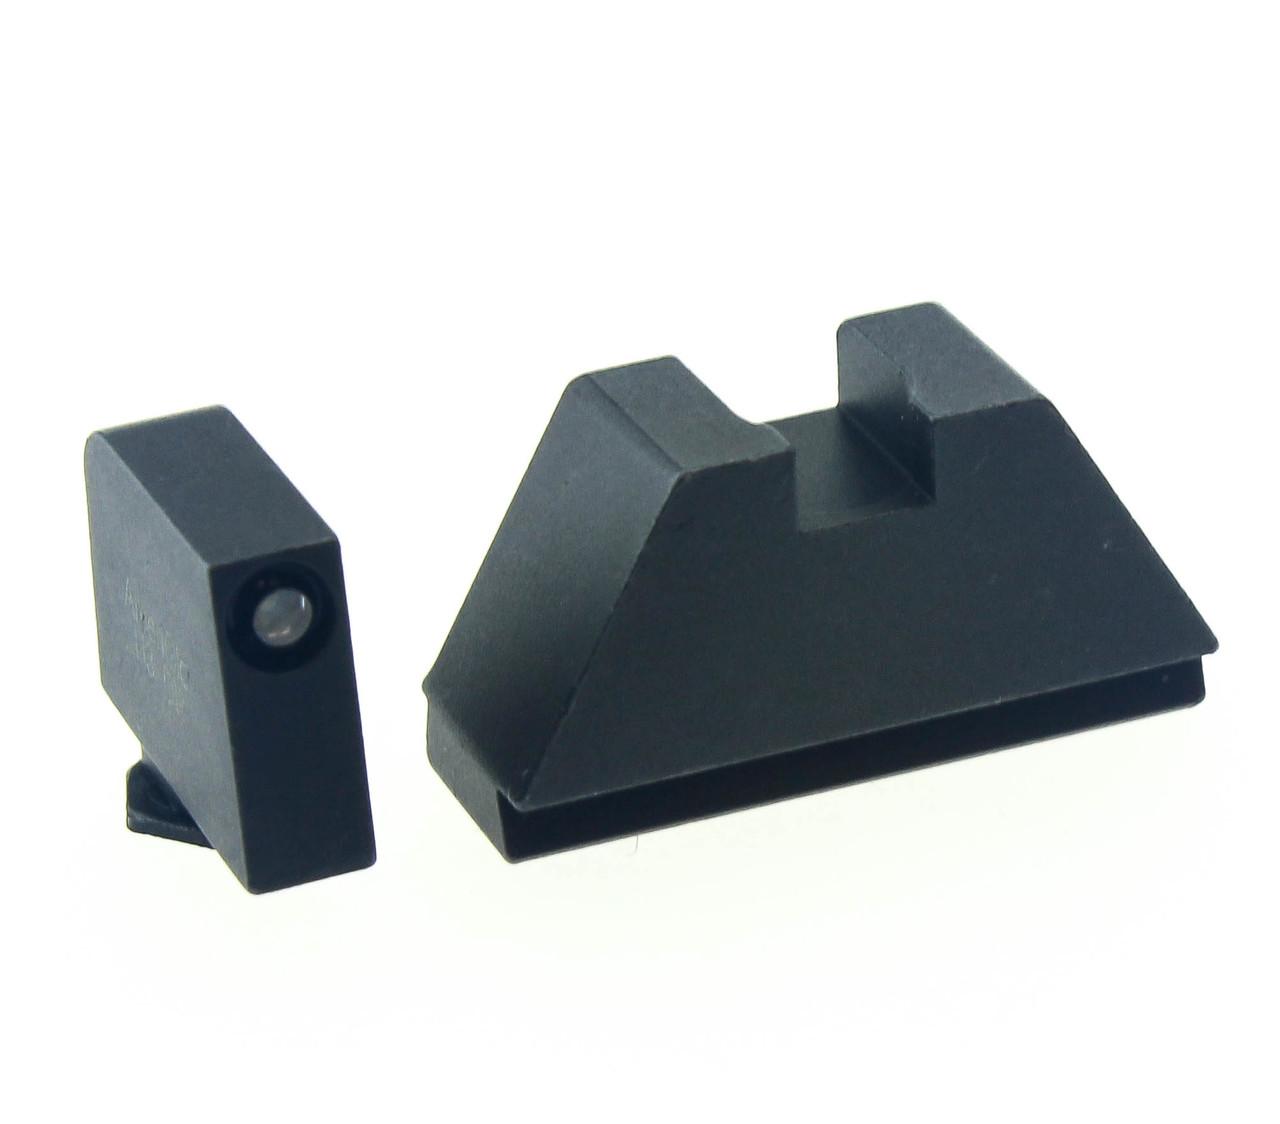 Ameriglo GL-810 Suppressor Height Sight for Glock